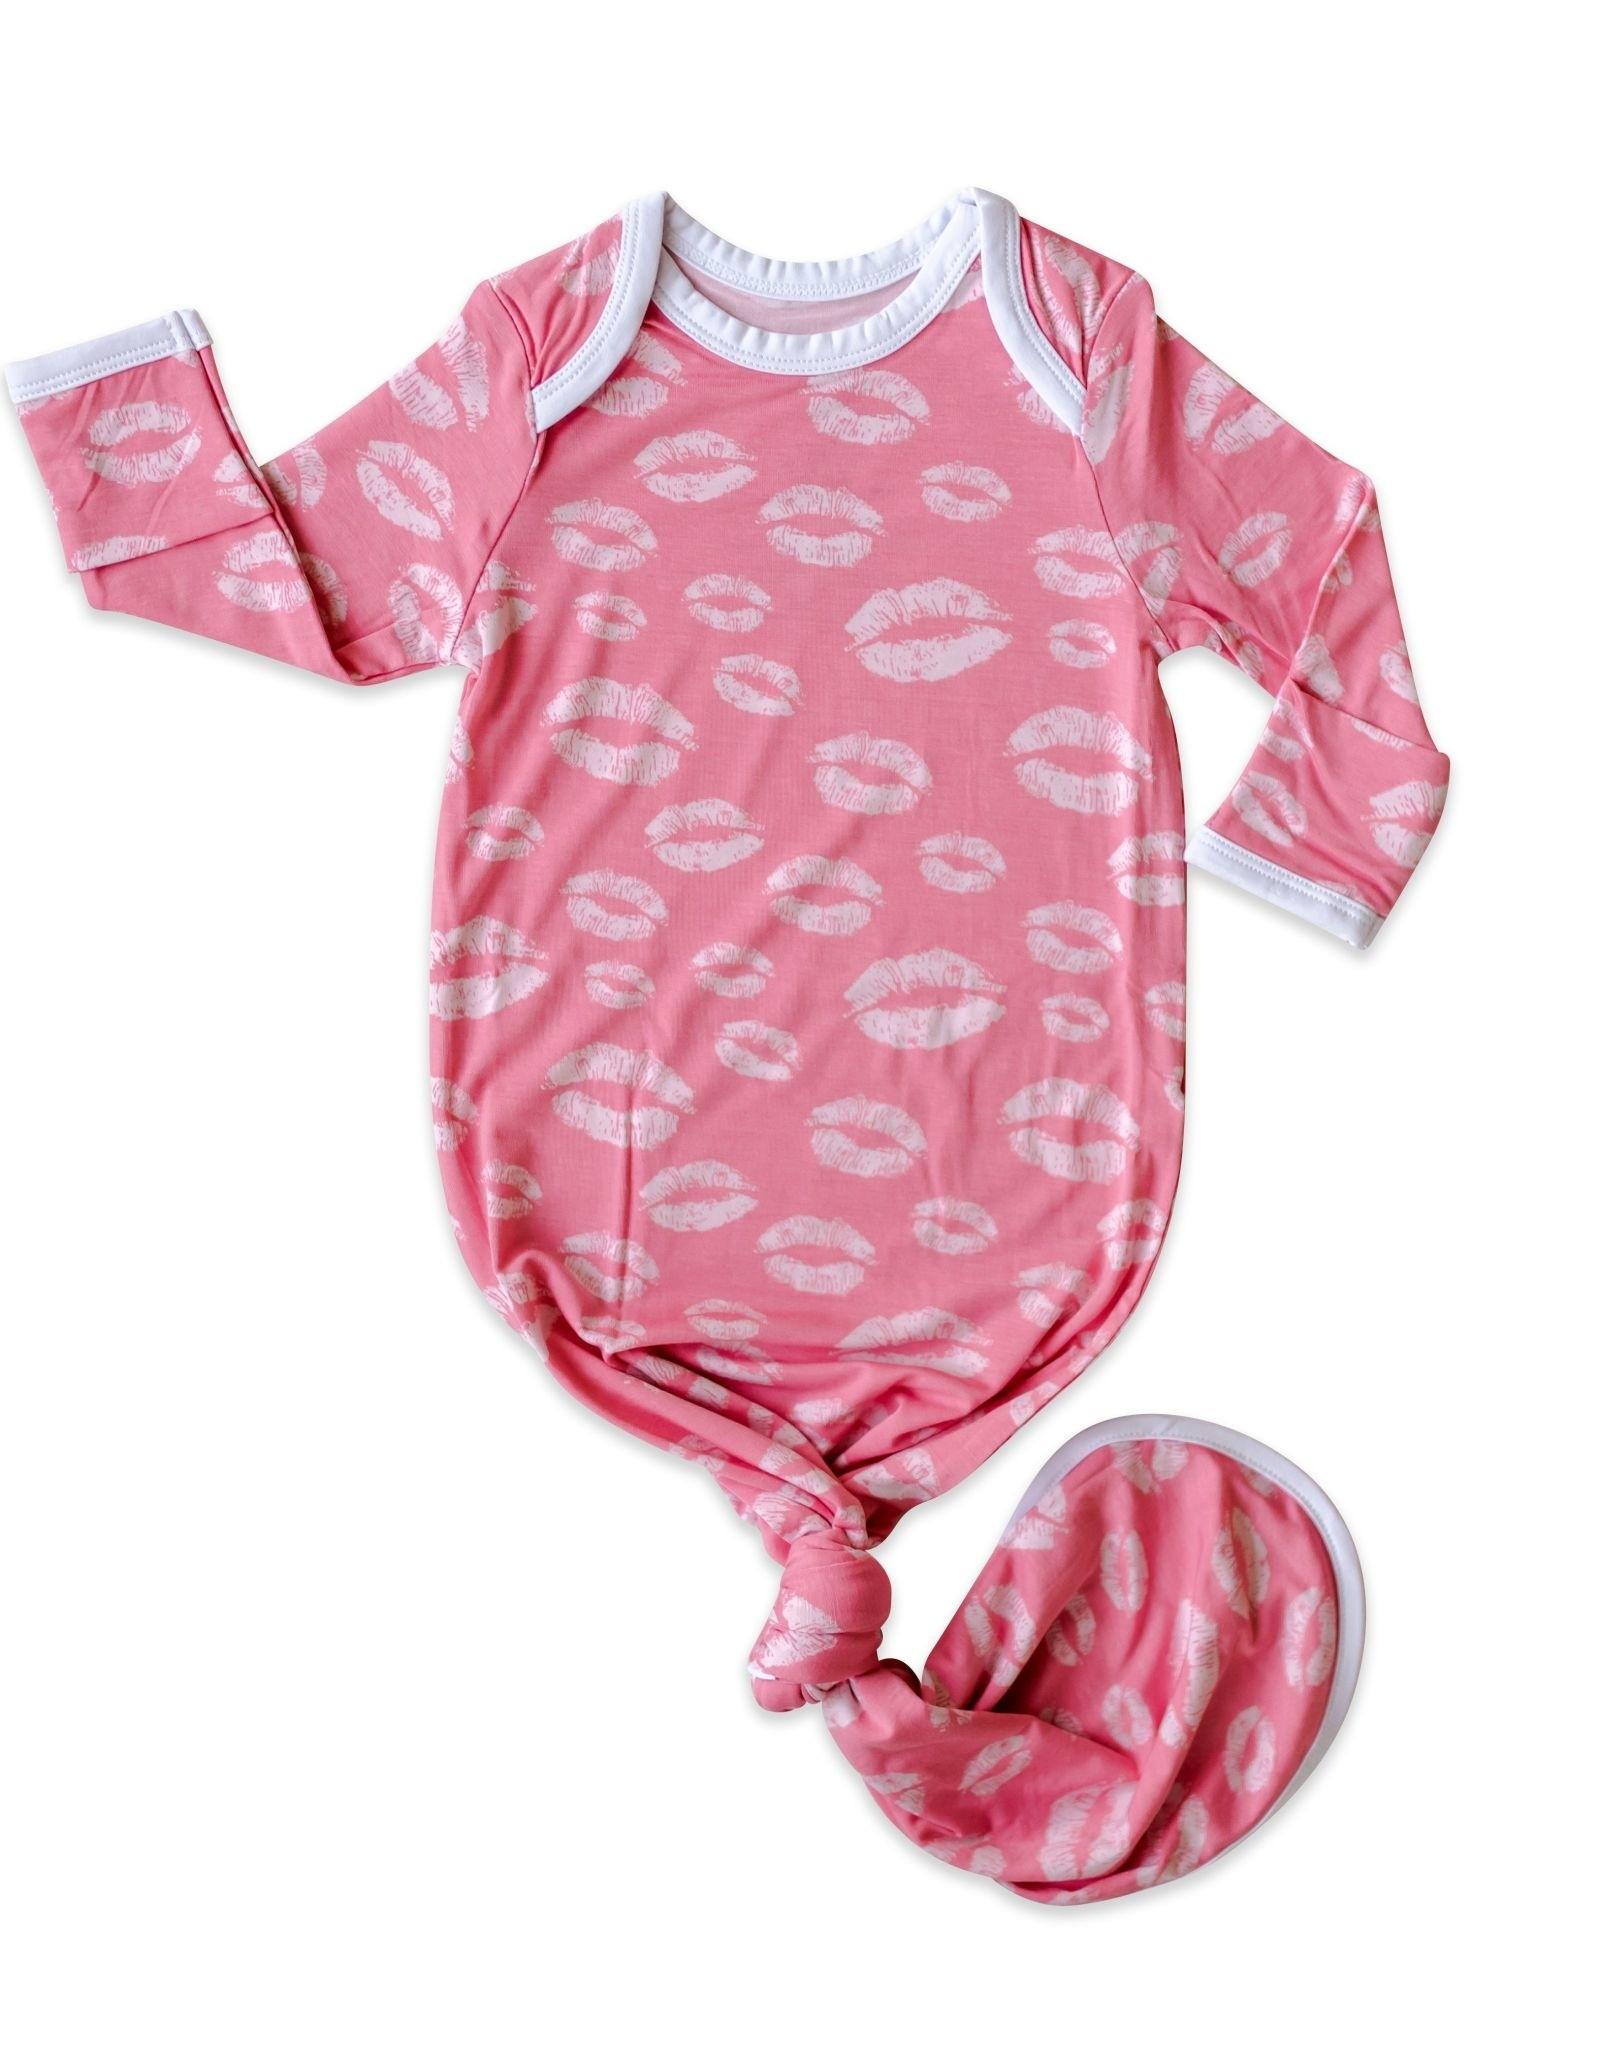 Little Sleepies pink kisses gown